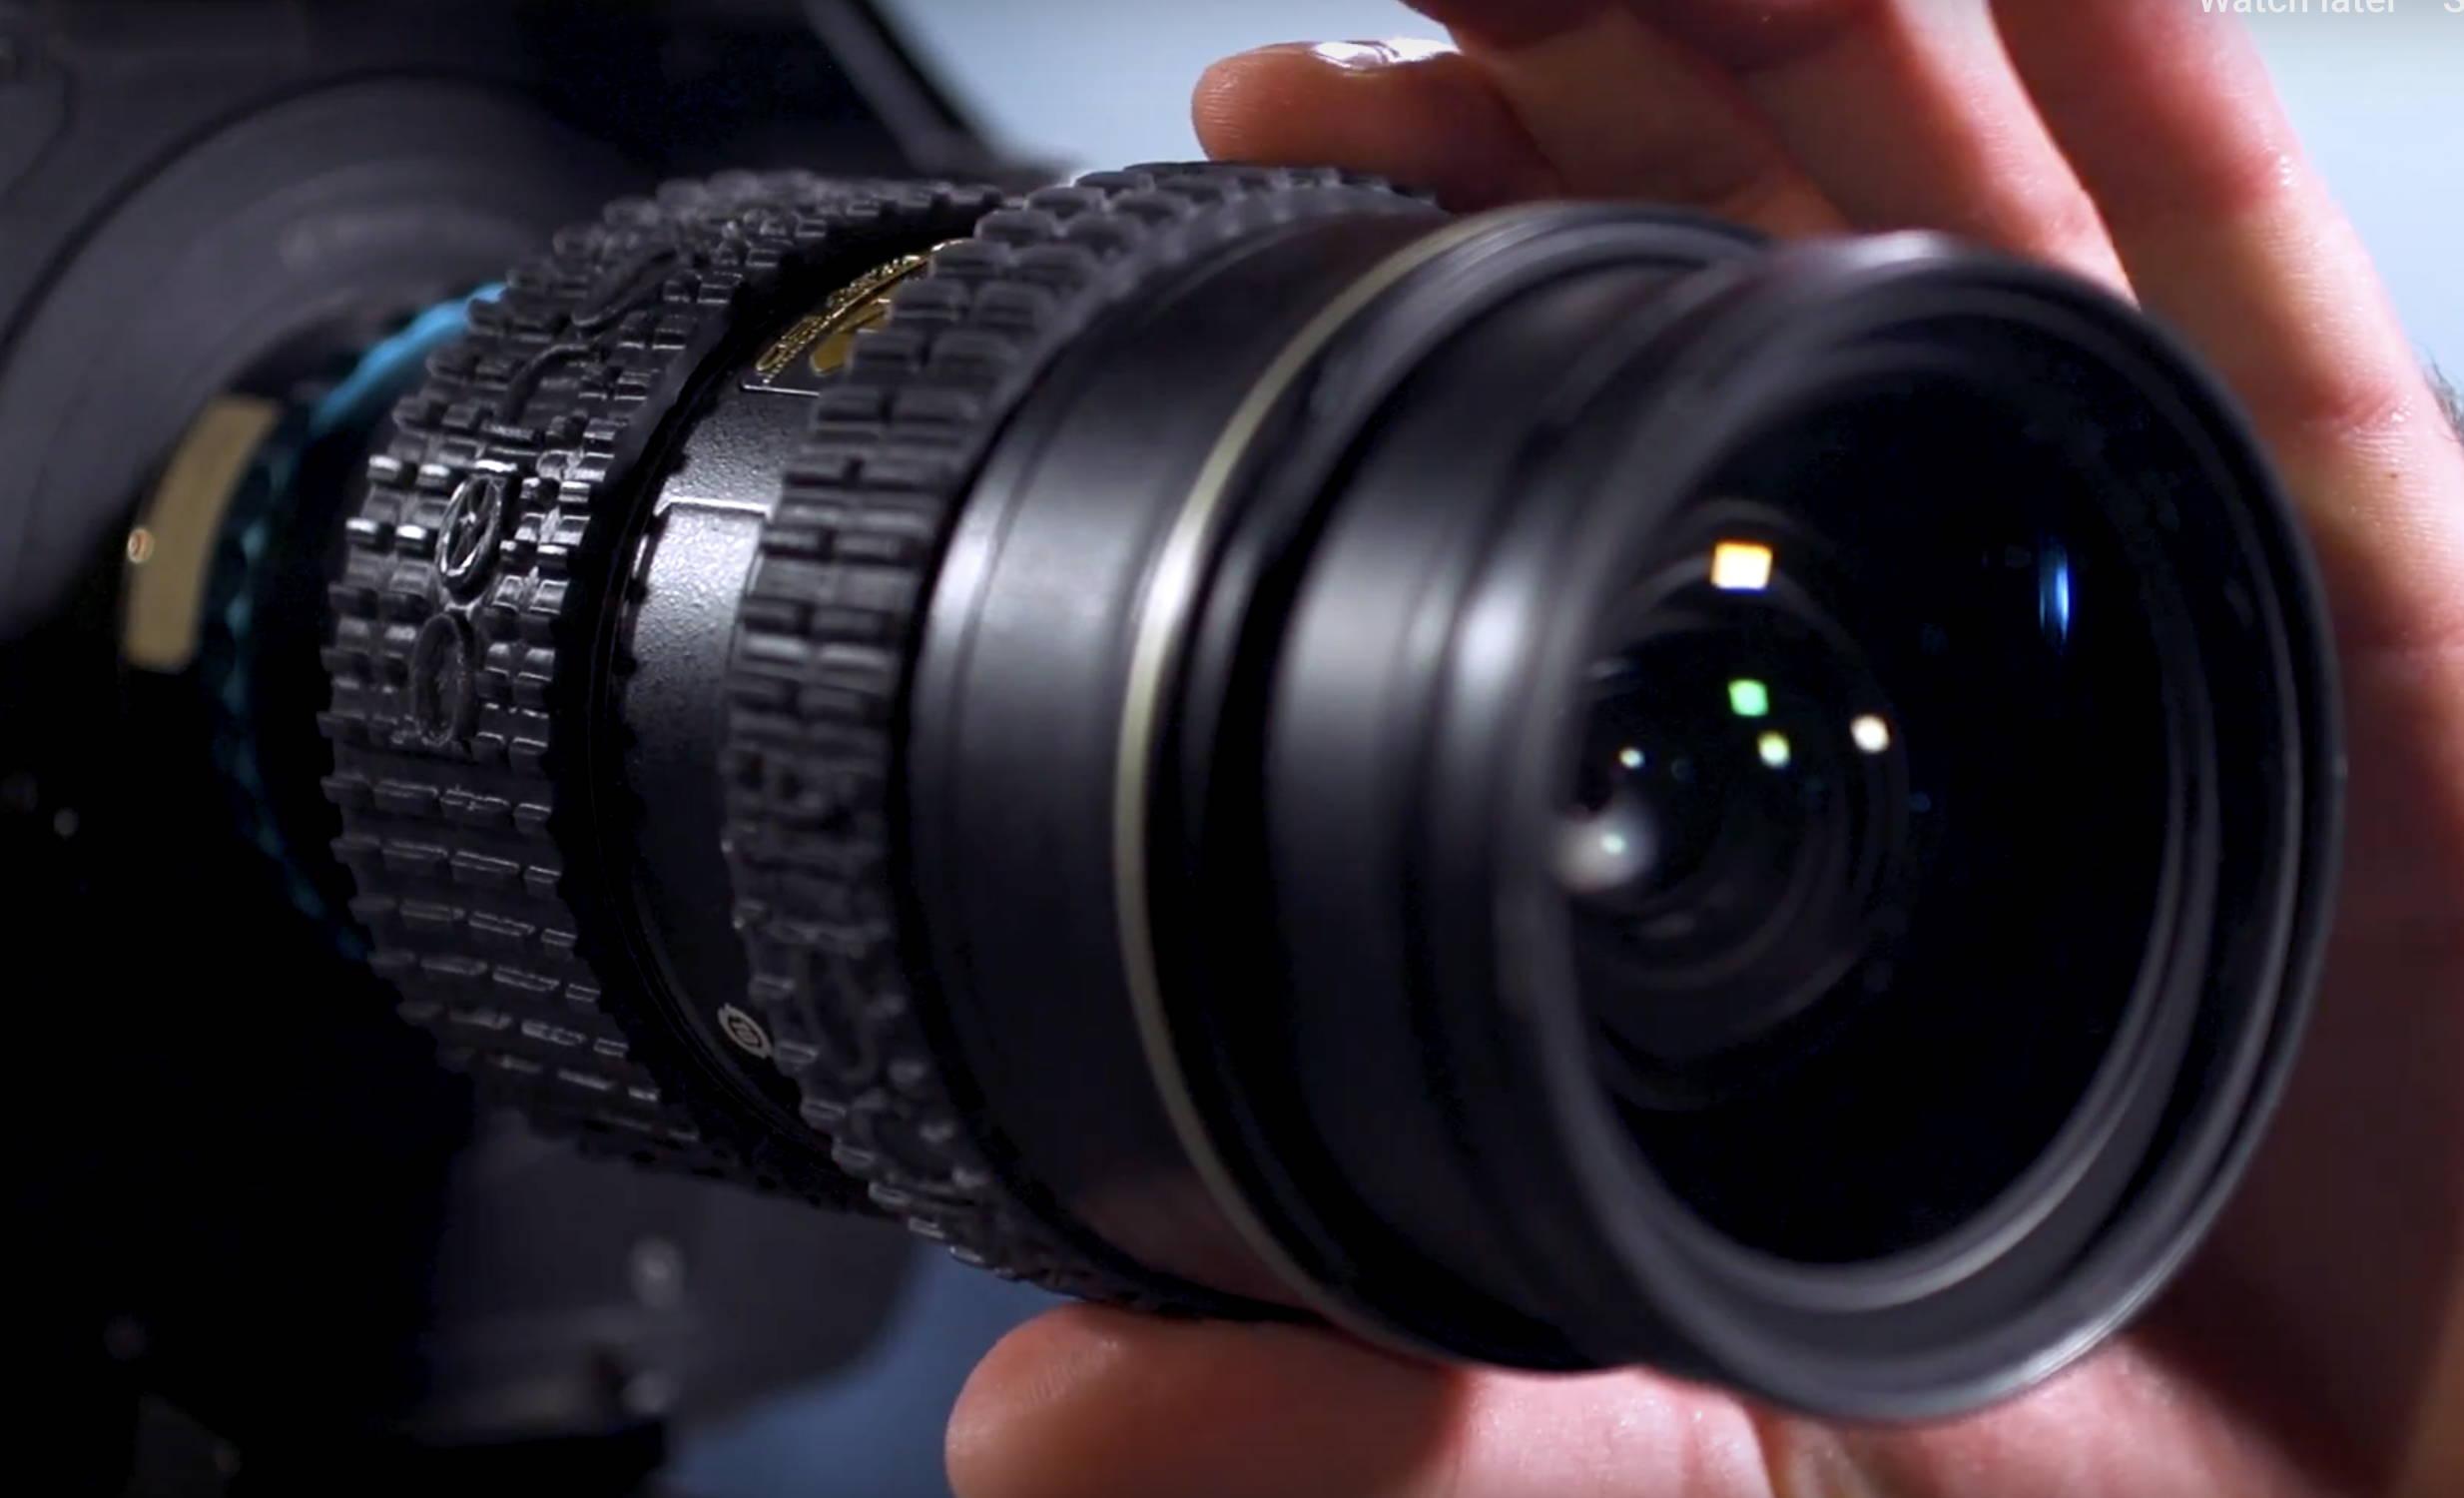 added grip on Nikon camera lenses